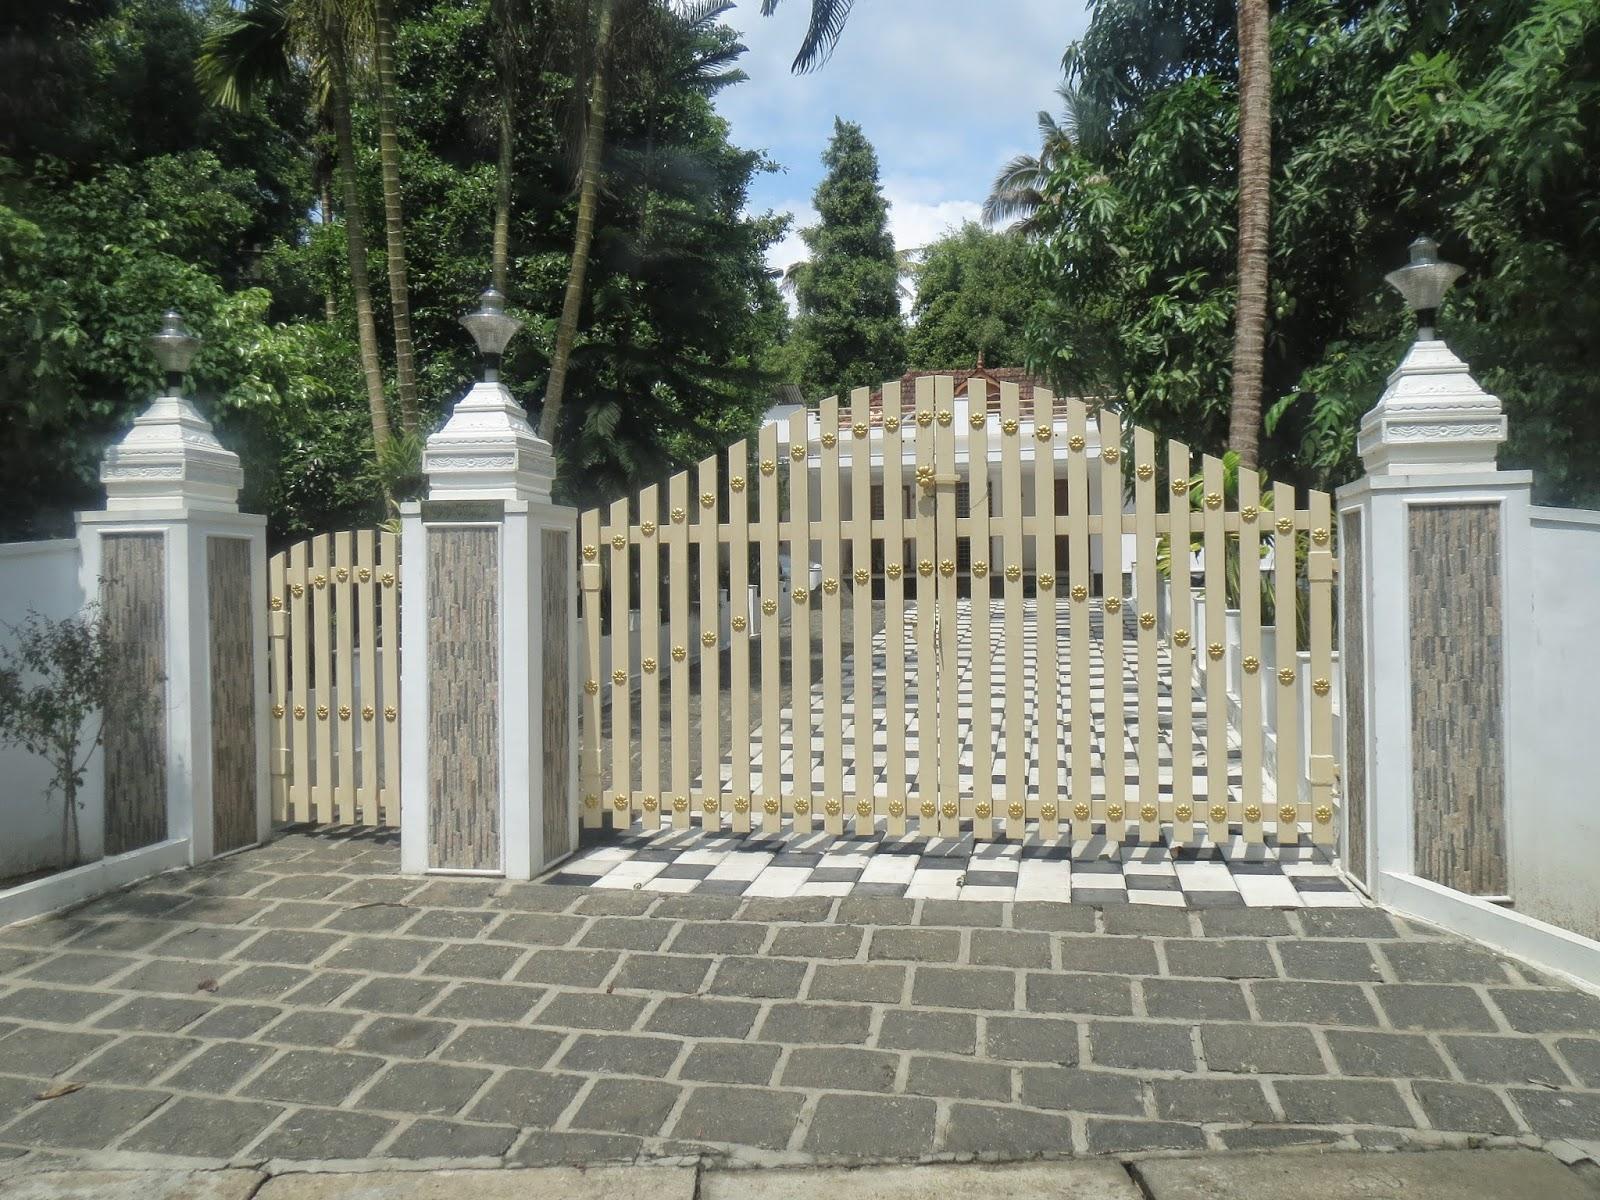 Kerala House Gates  Kerala Gates Designs. Kerala Gate Designs  Kerala House Gates